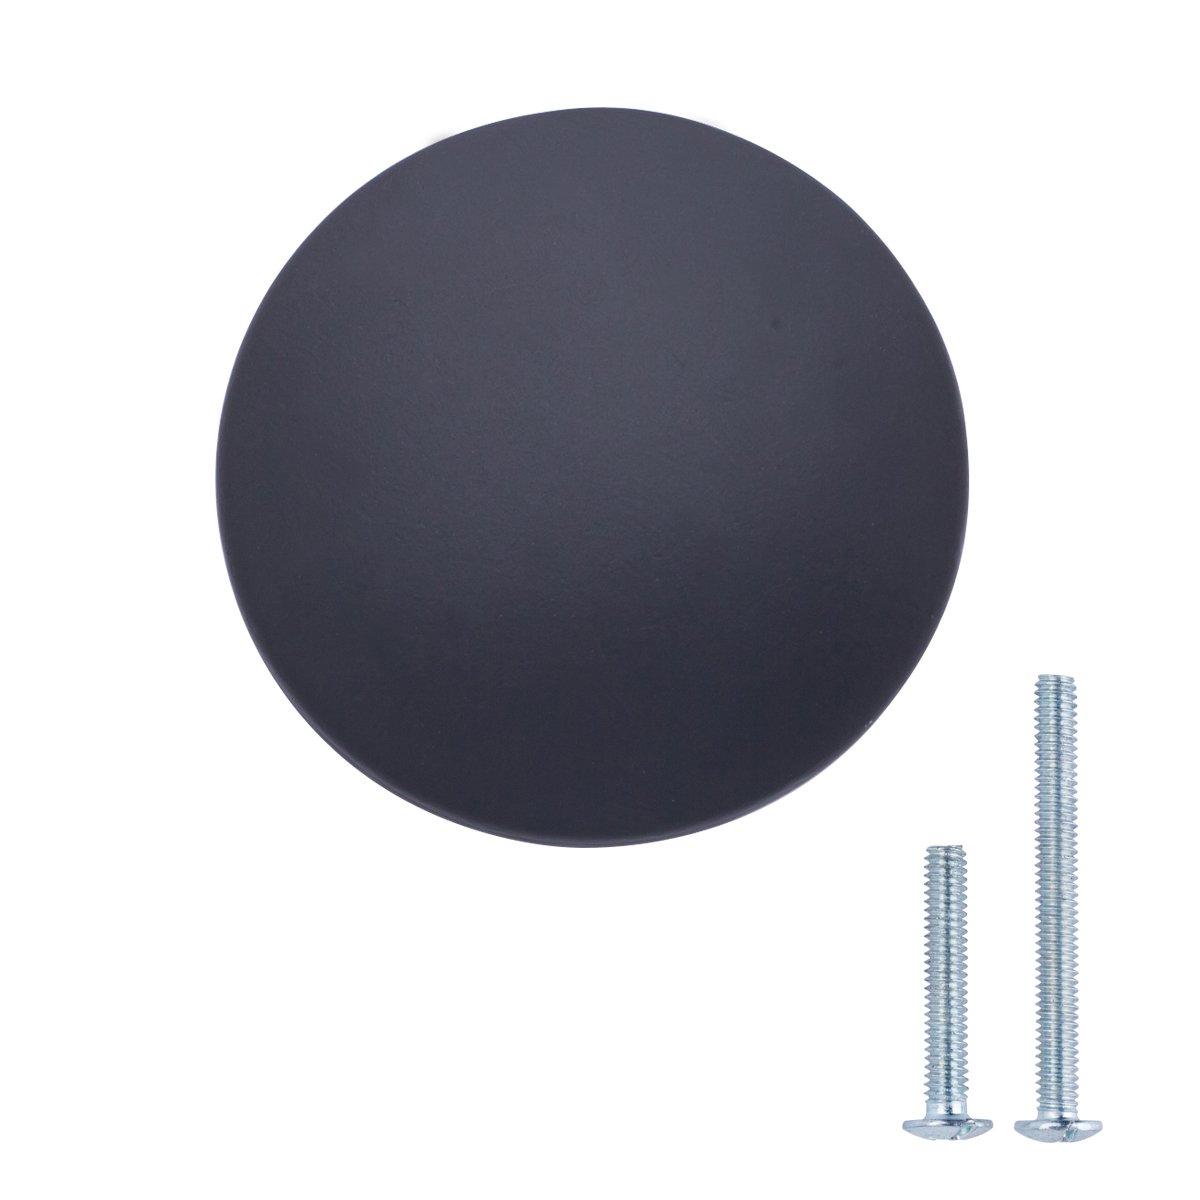 AmazonBasics Round Flat Cabinet Knob, 1.37'' Diameter, Flat Black, 10-Pack